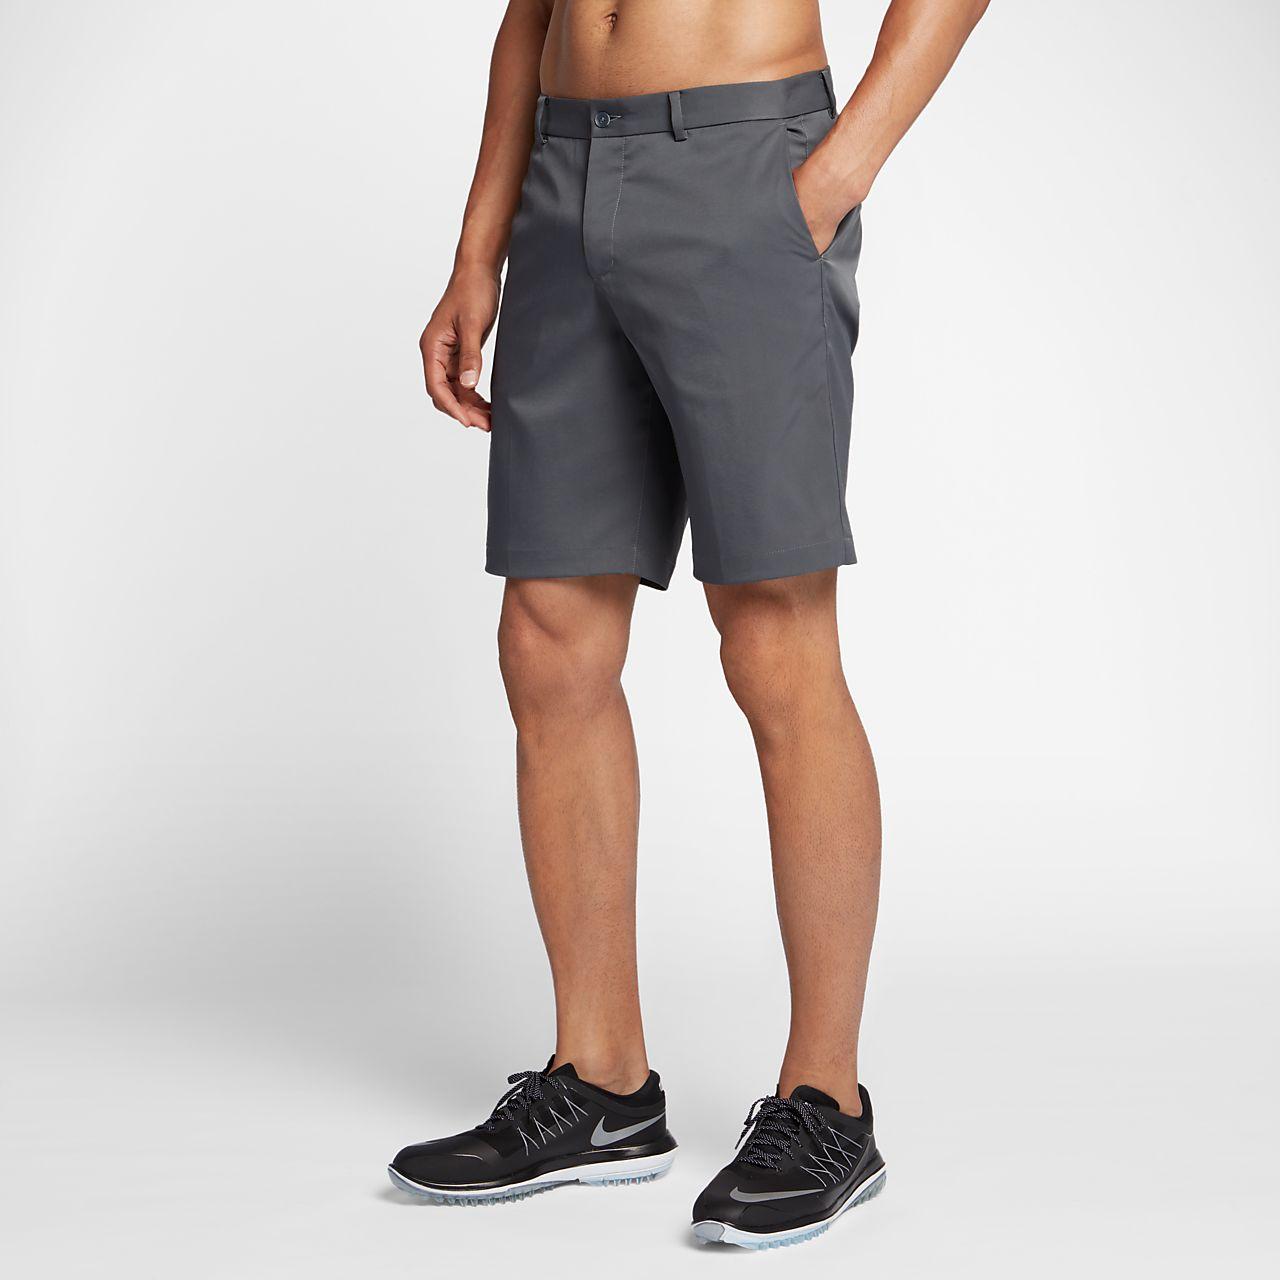 "Nike Flat Front Men's 10.5"" (26.5cm approx.) Golf Shorts"